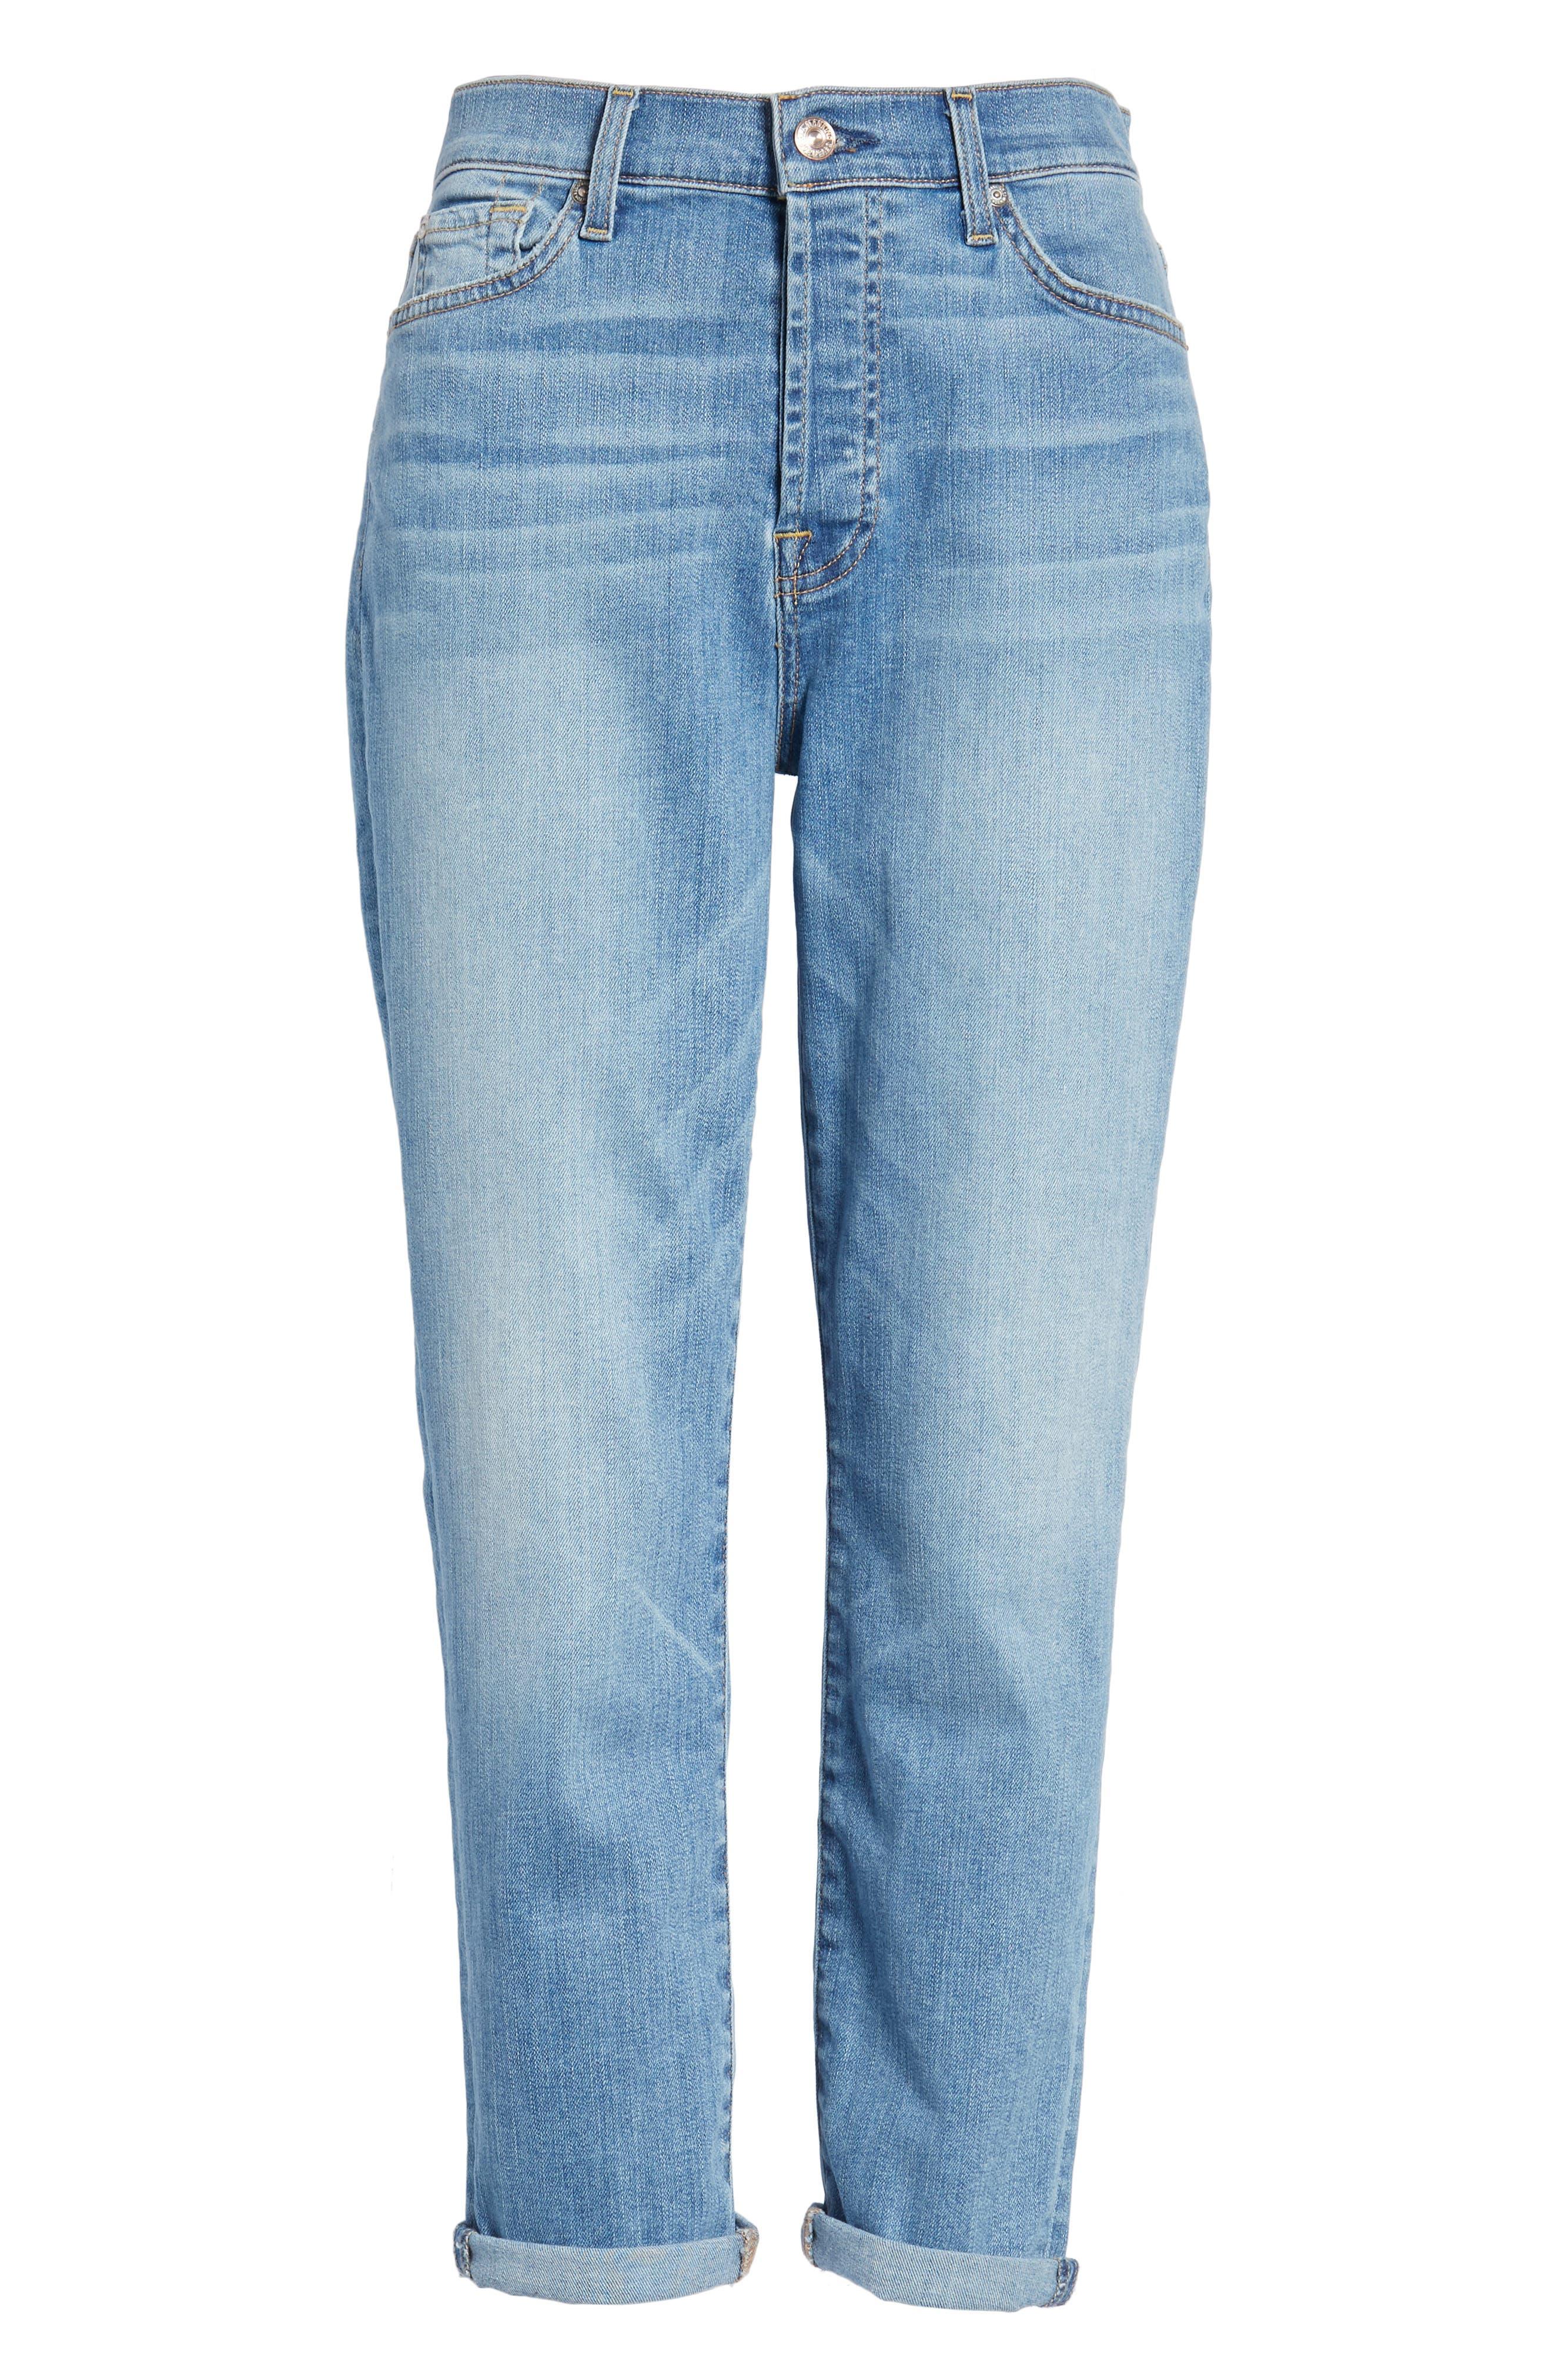 Josefina High Waist Boyfriend Jeans,                             Alternate thumbnail 7, color,